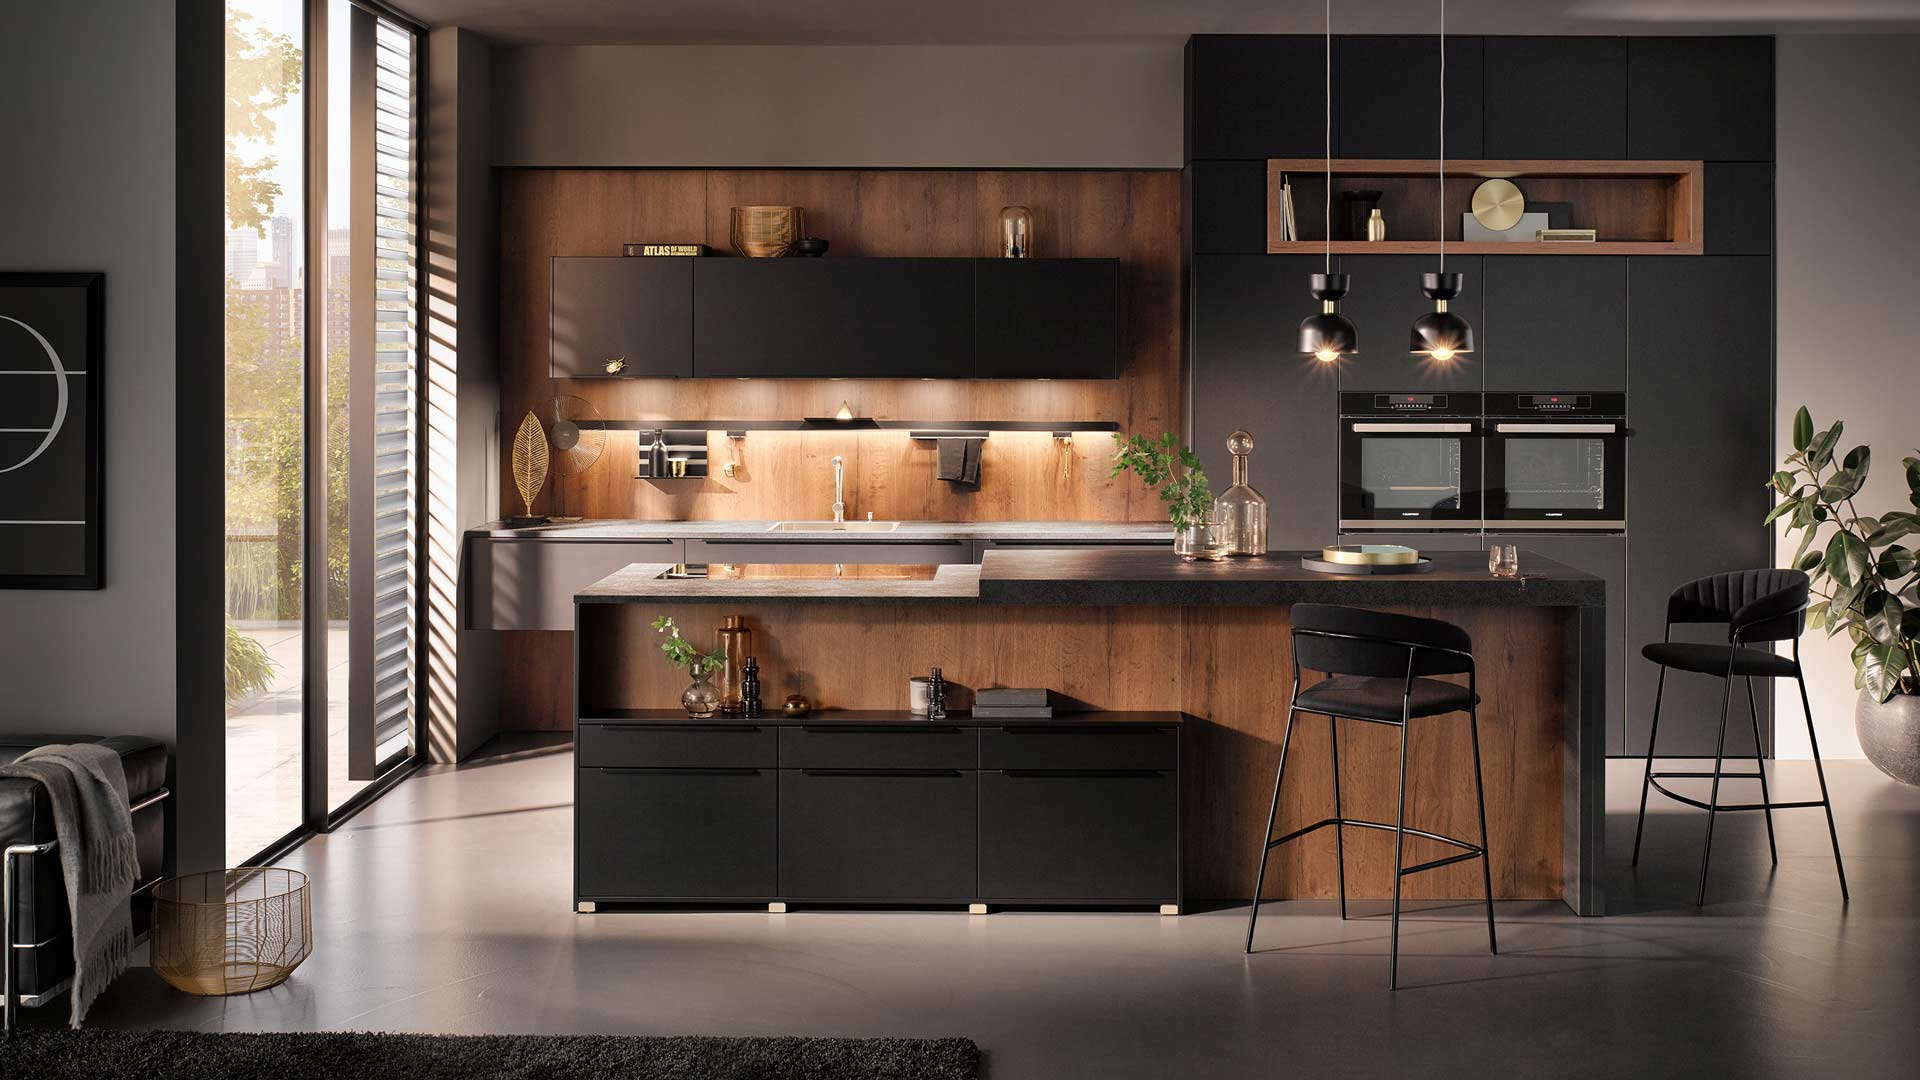 Küchentrends 2020 im Miele Center Markant